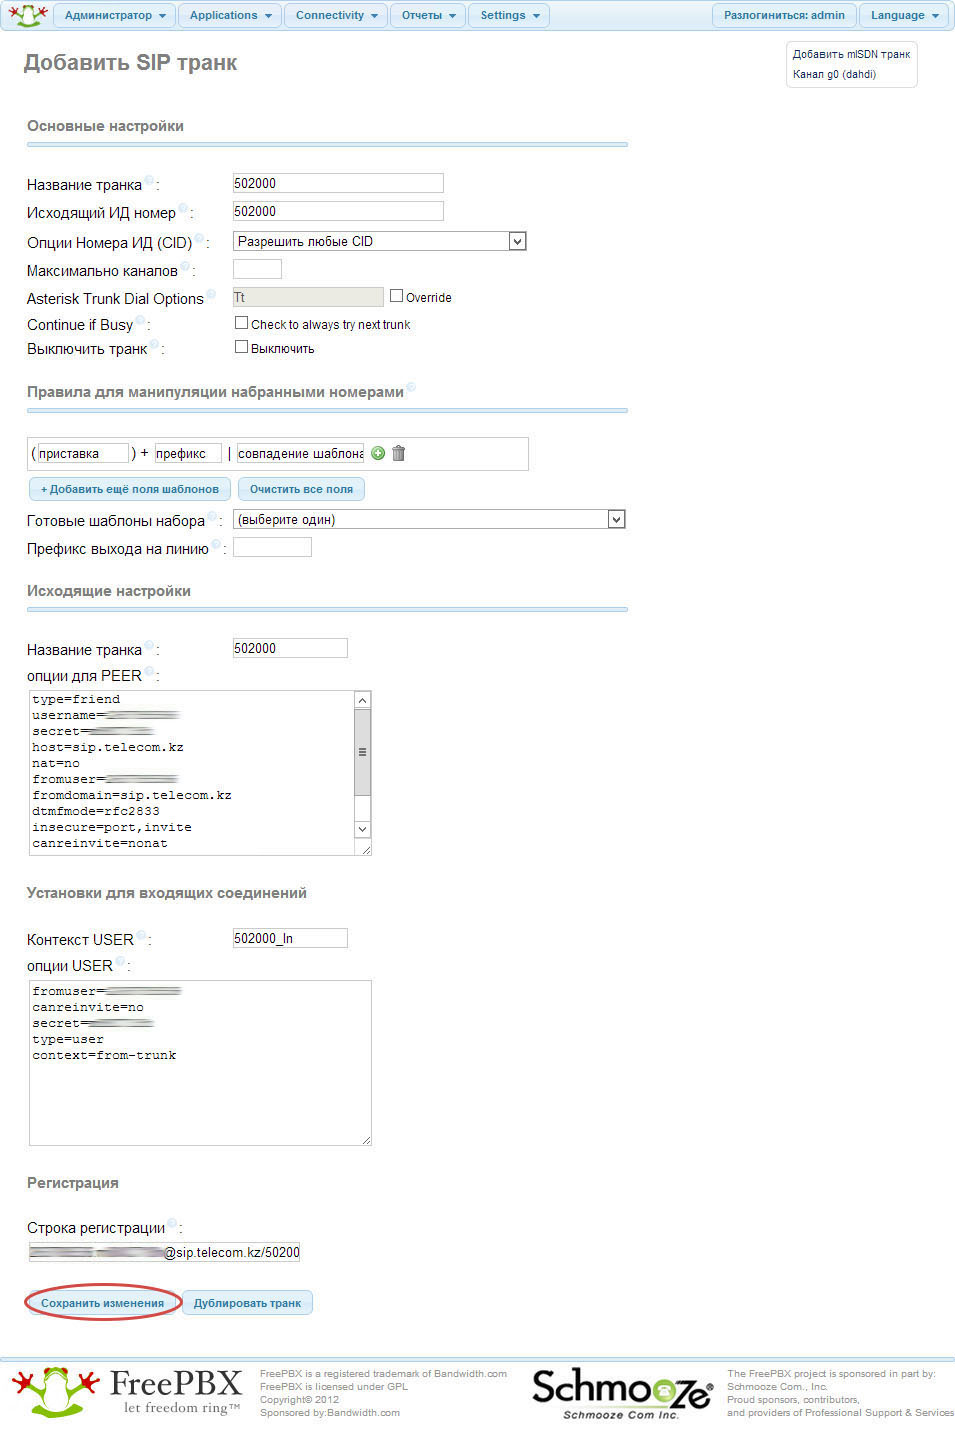 Установка и настройка Asterisk под iD Phone (iDPhone) — IT-МИР. ПОМОЩЬ В IT-МИРЕ 2020